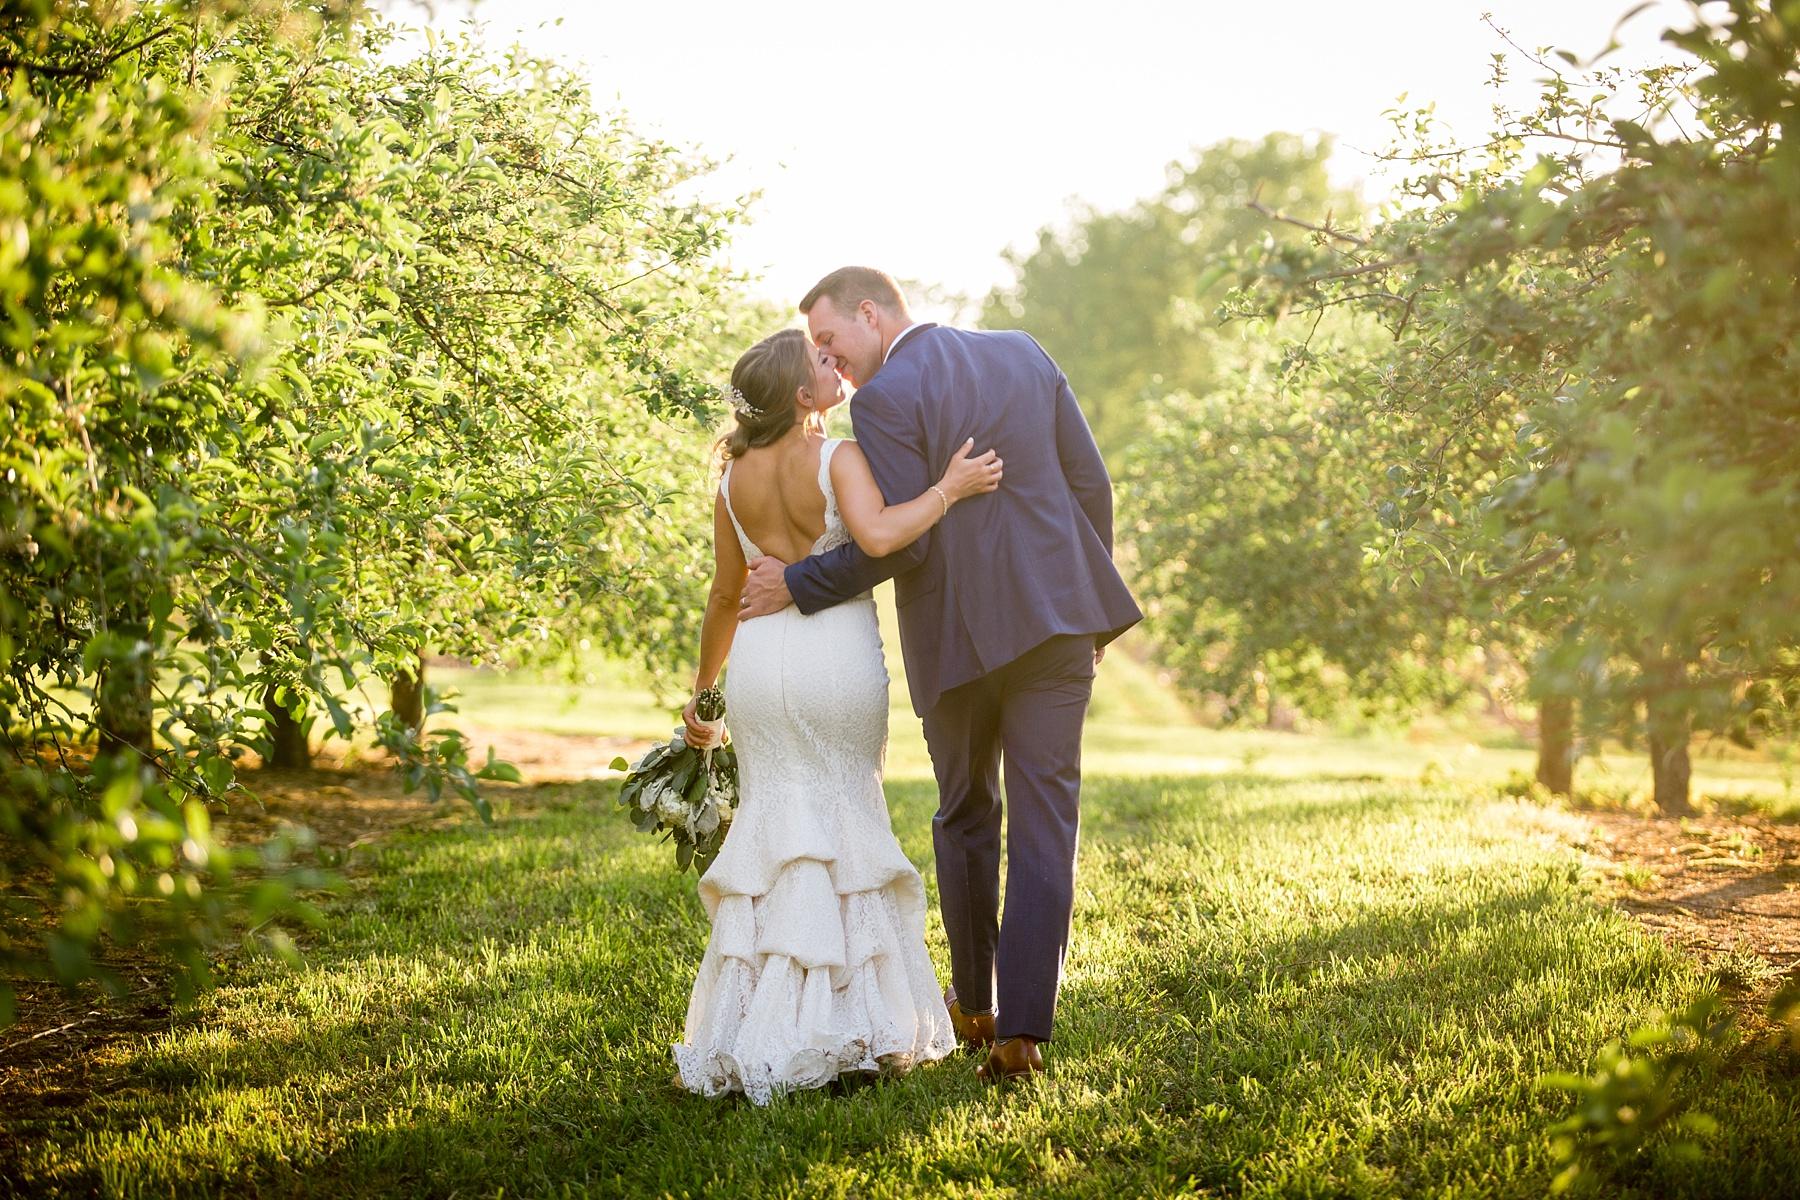 Brandon_Shafer_Photography_Kara_Doug_12_corners_Wedding_Benton_Harbor_0079.jpg